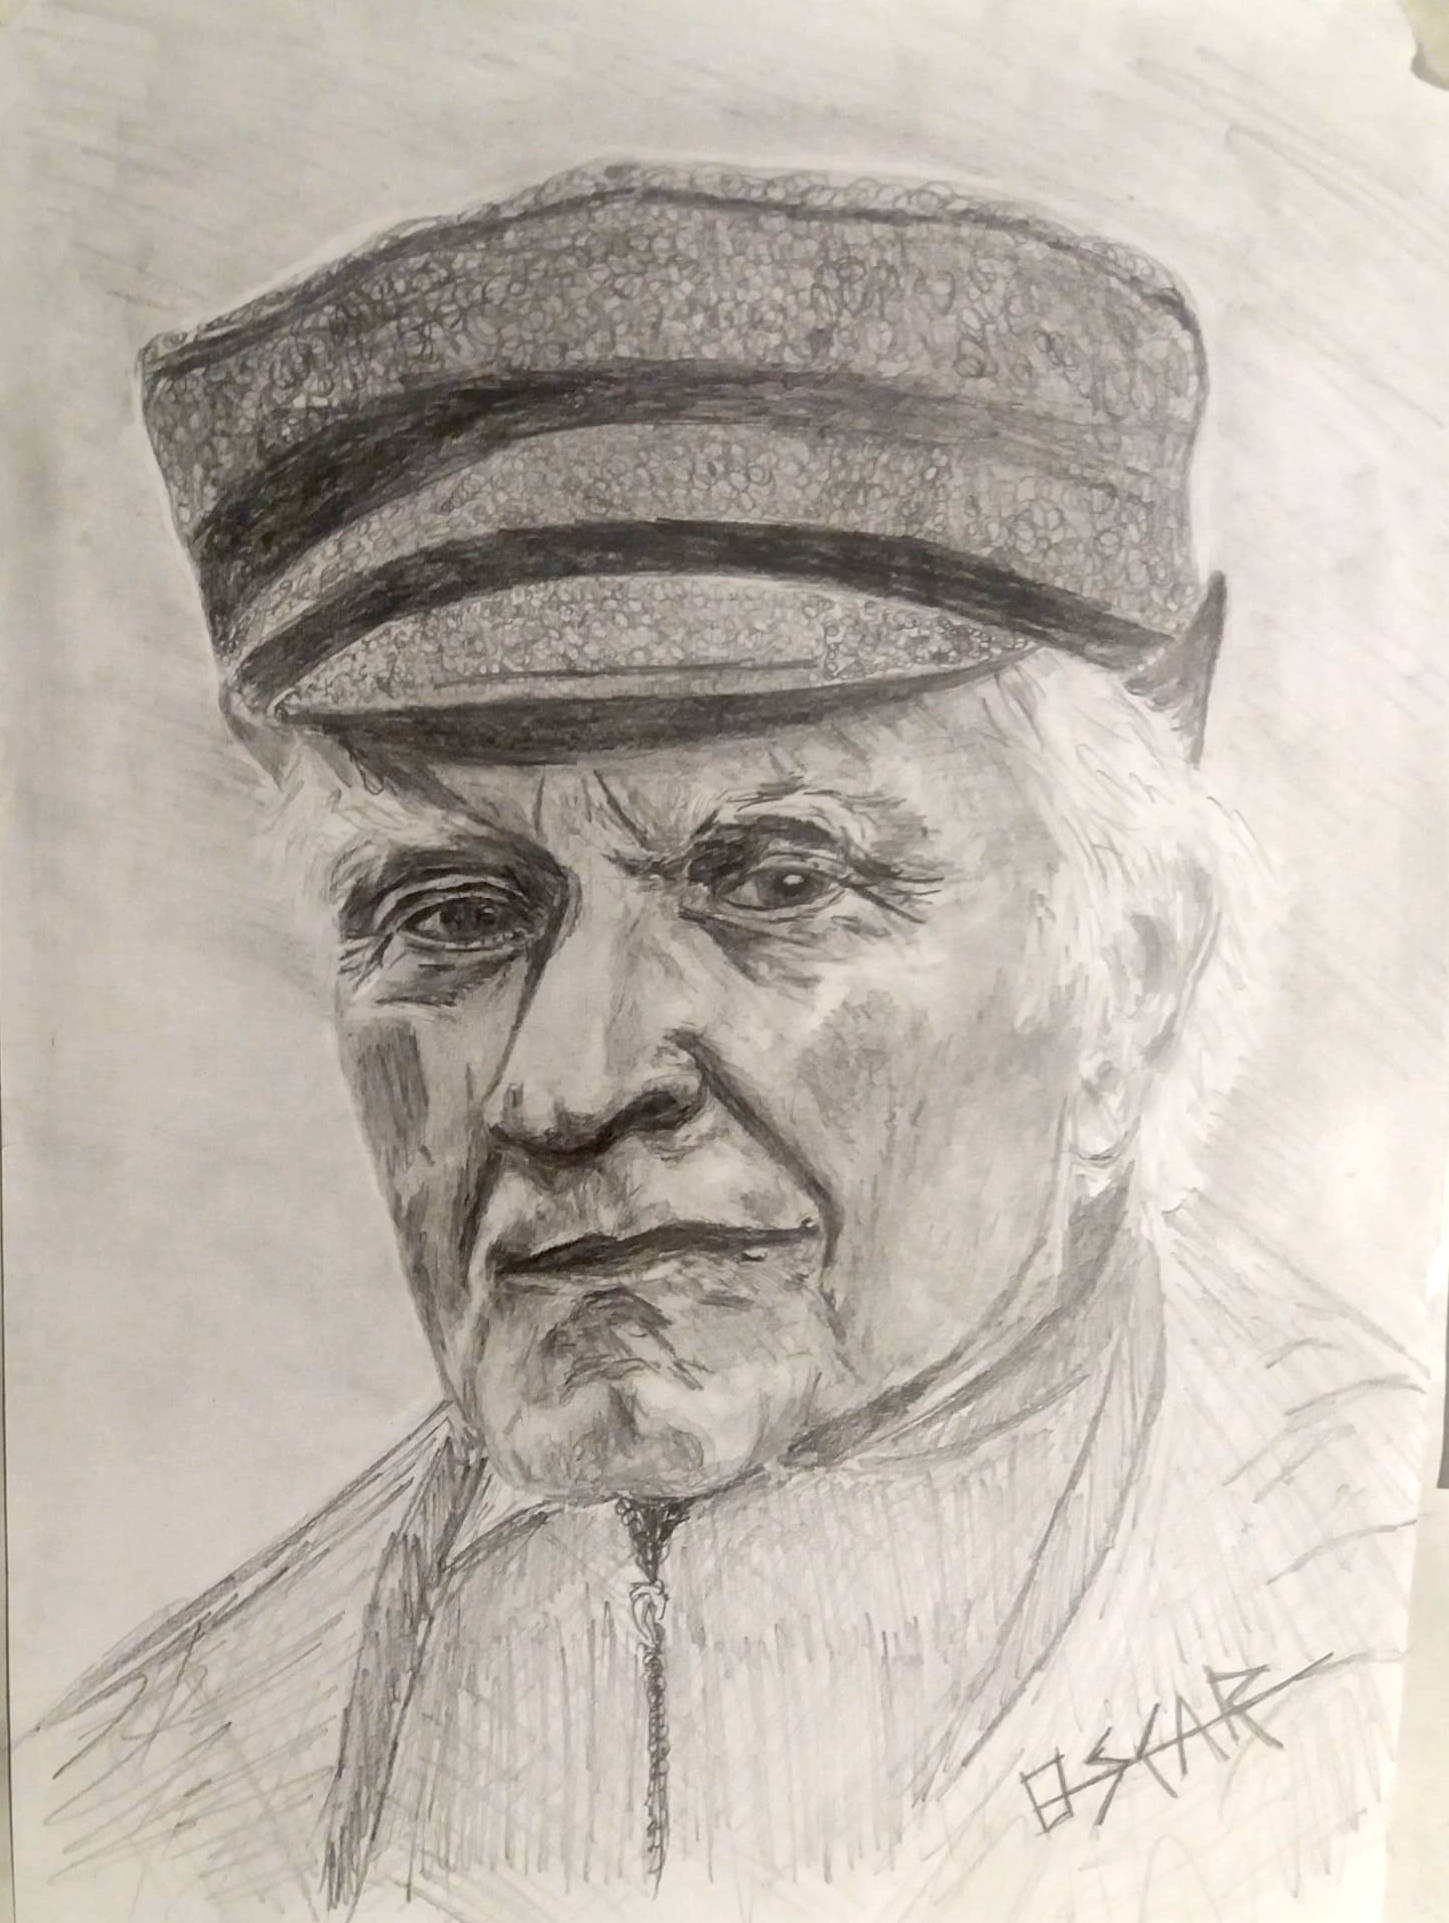 dibujo señor con gorra